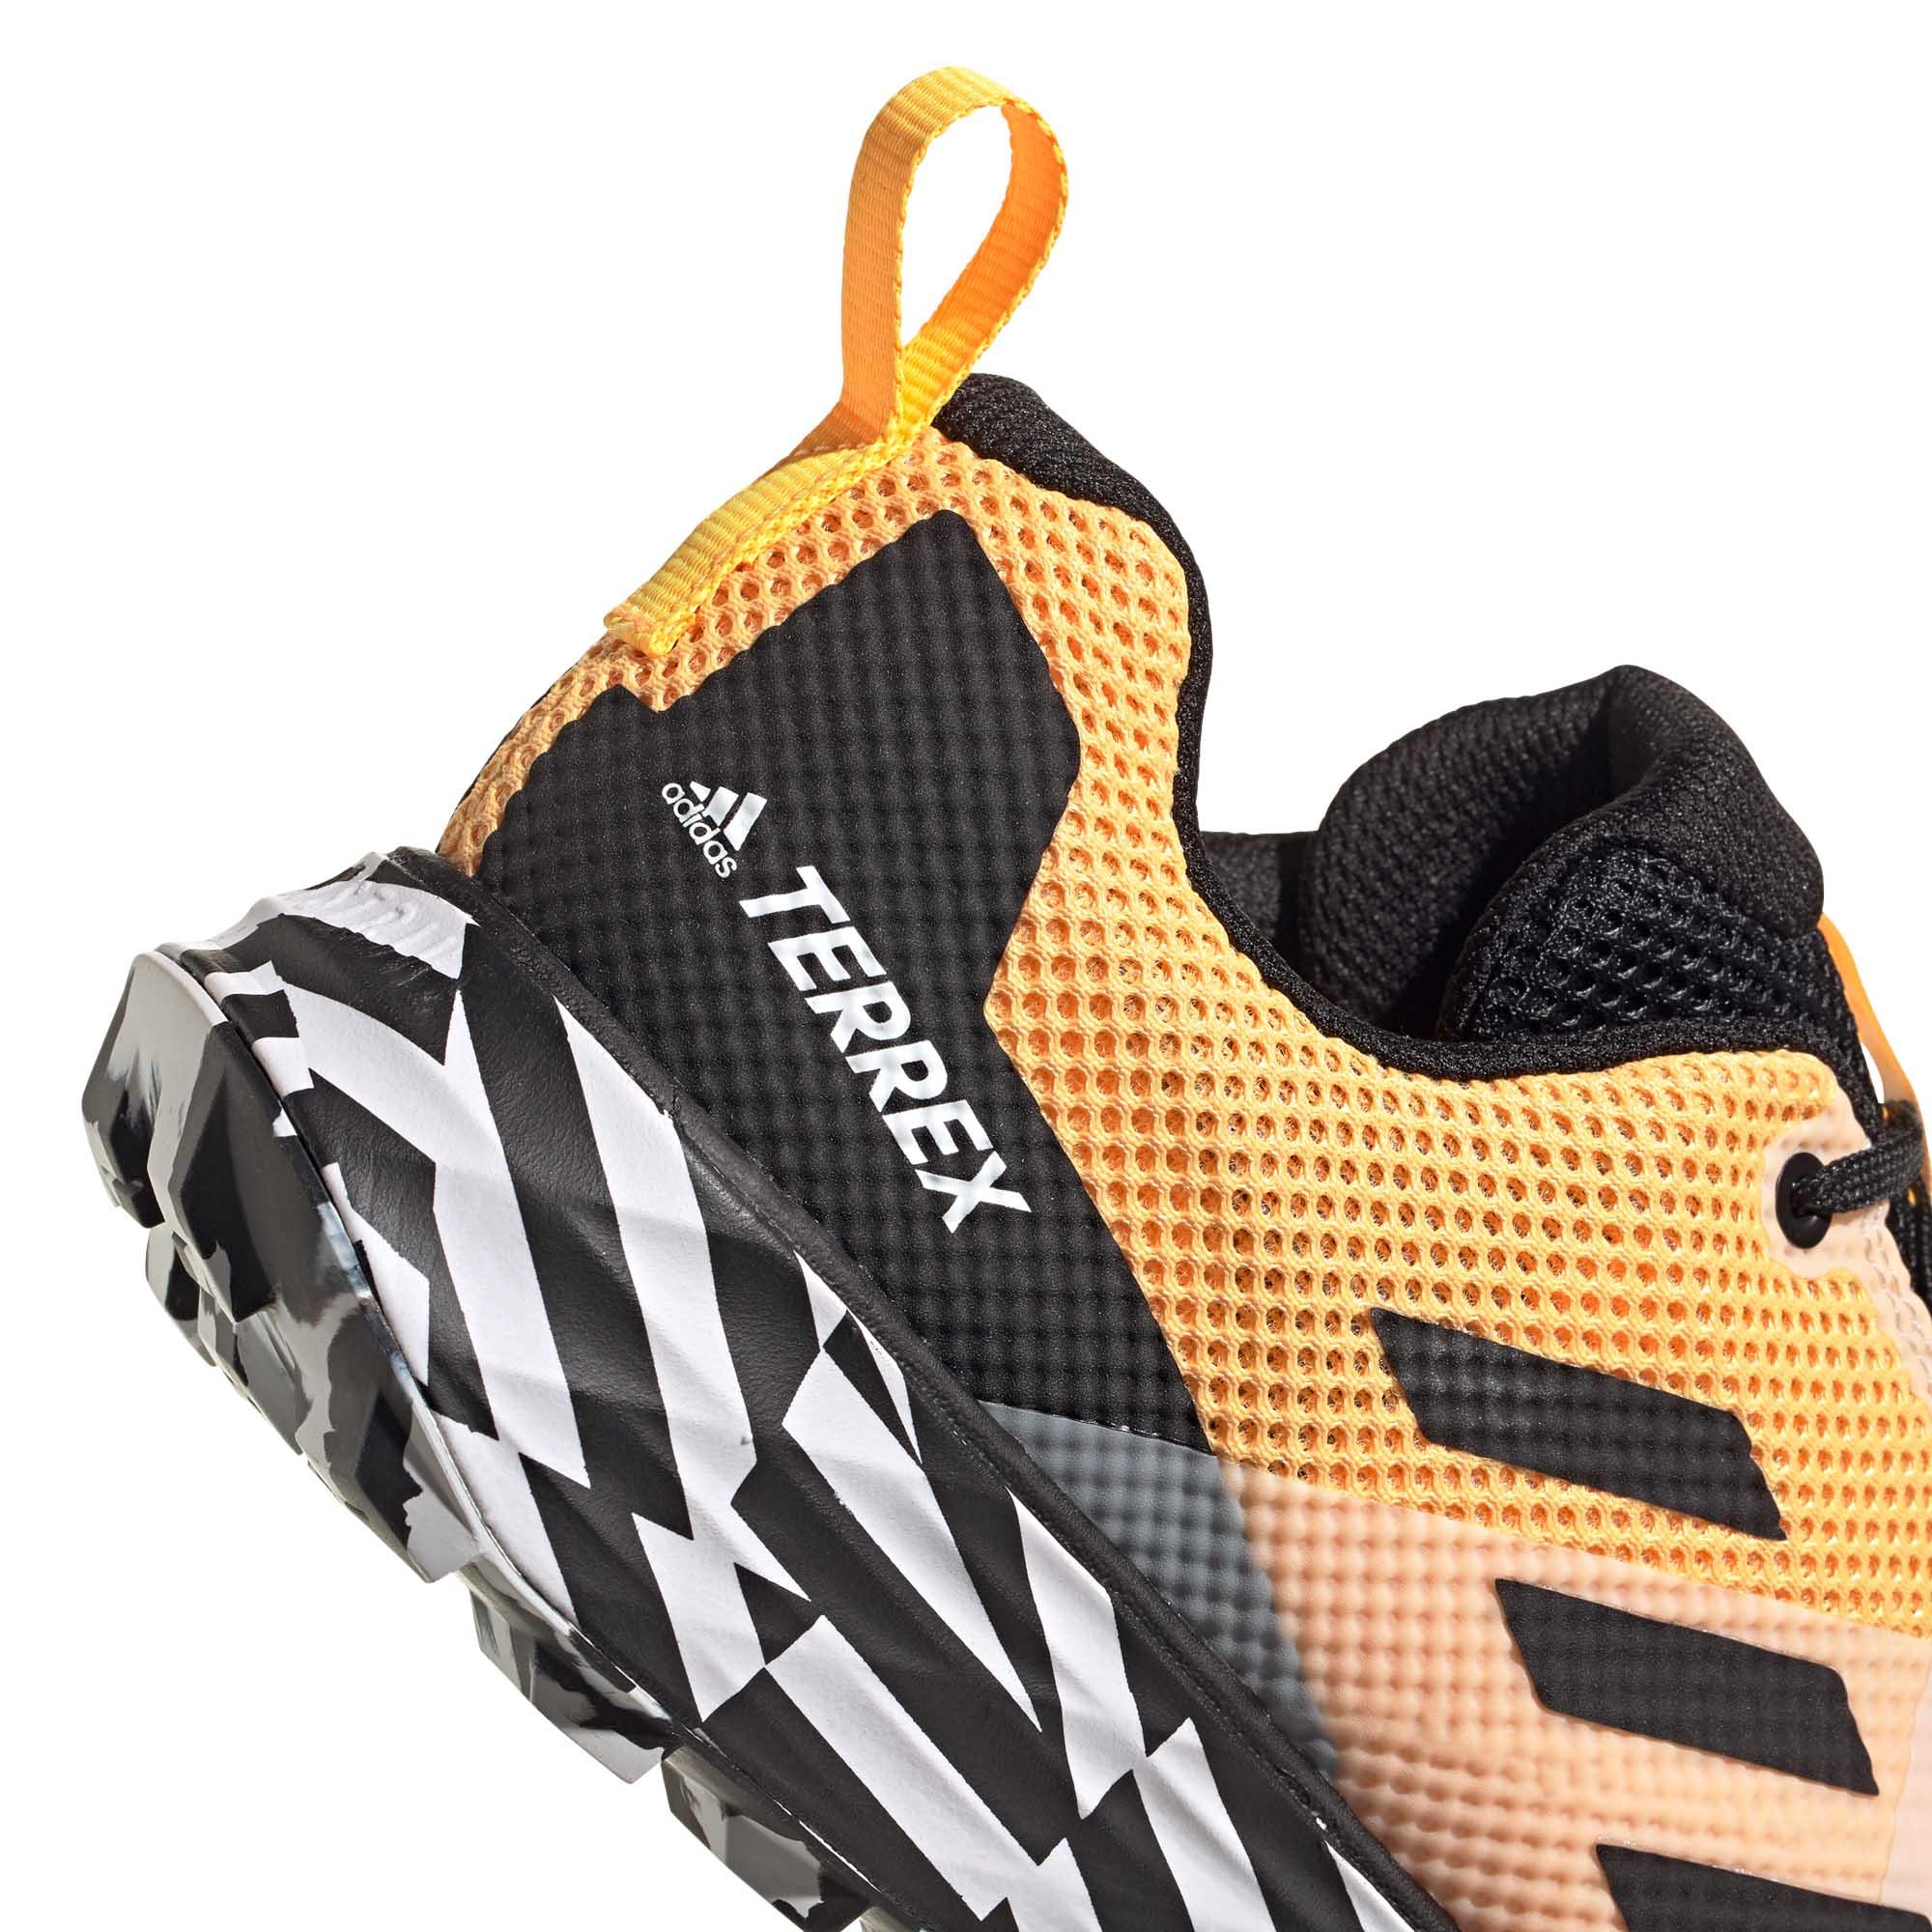 miniature 9 - Adidas-Terrex-deux-homme-trail-running-Trainer-Shoe-Or-Noir-Blanc